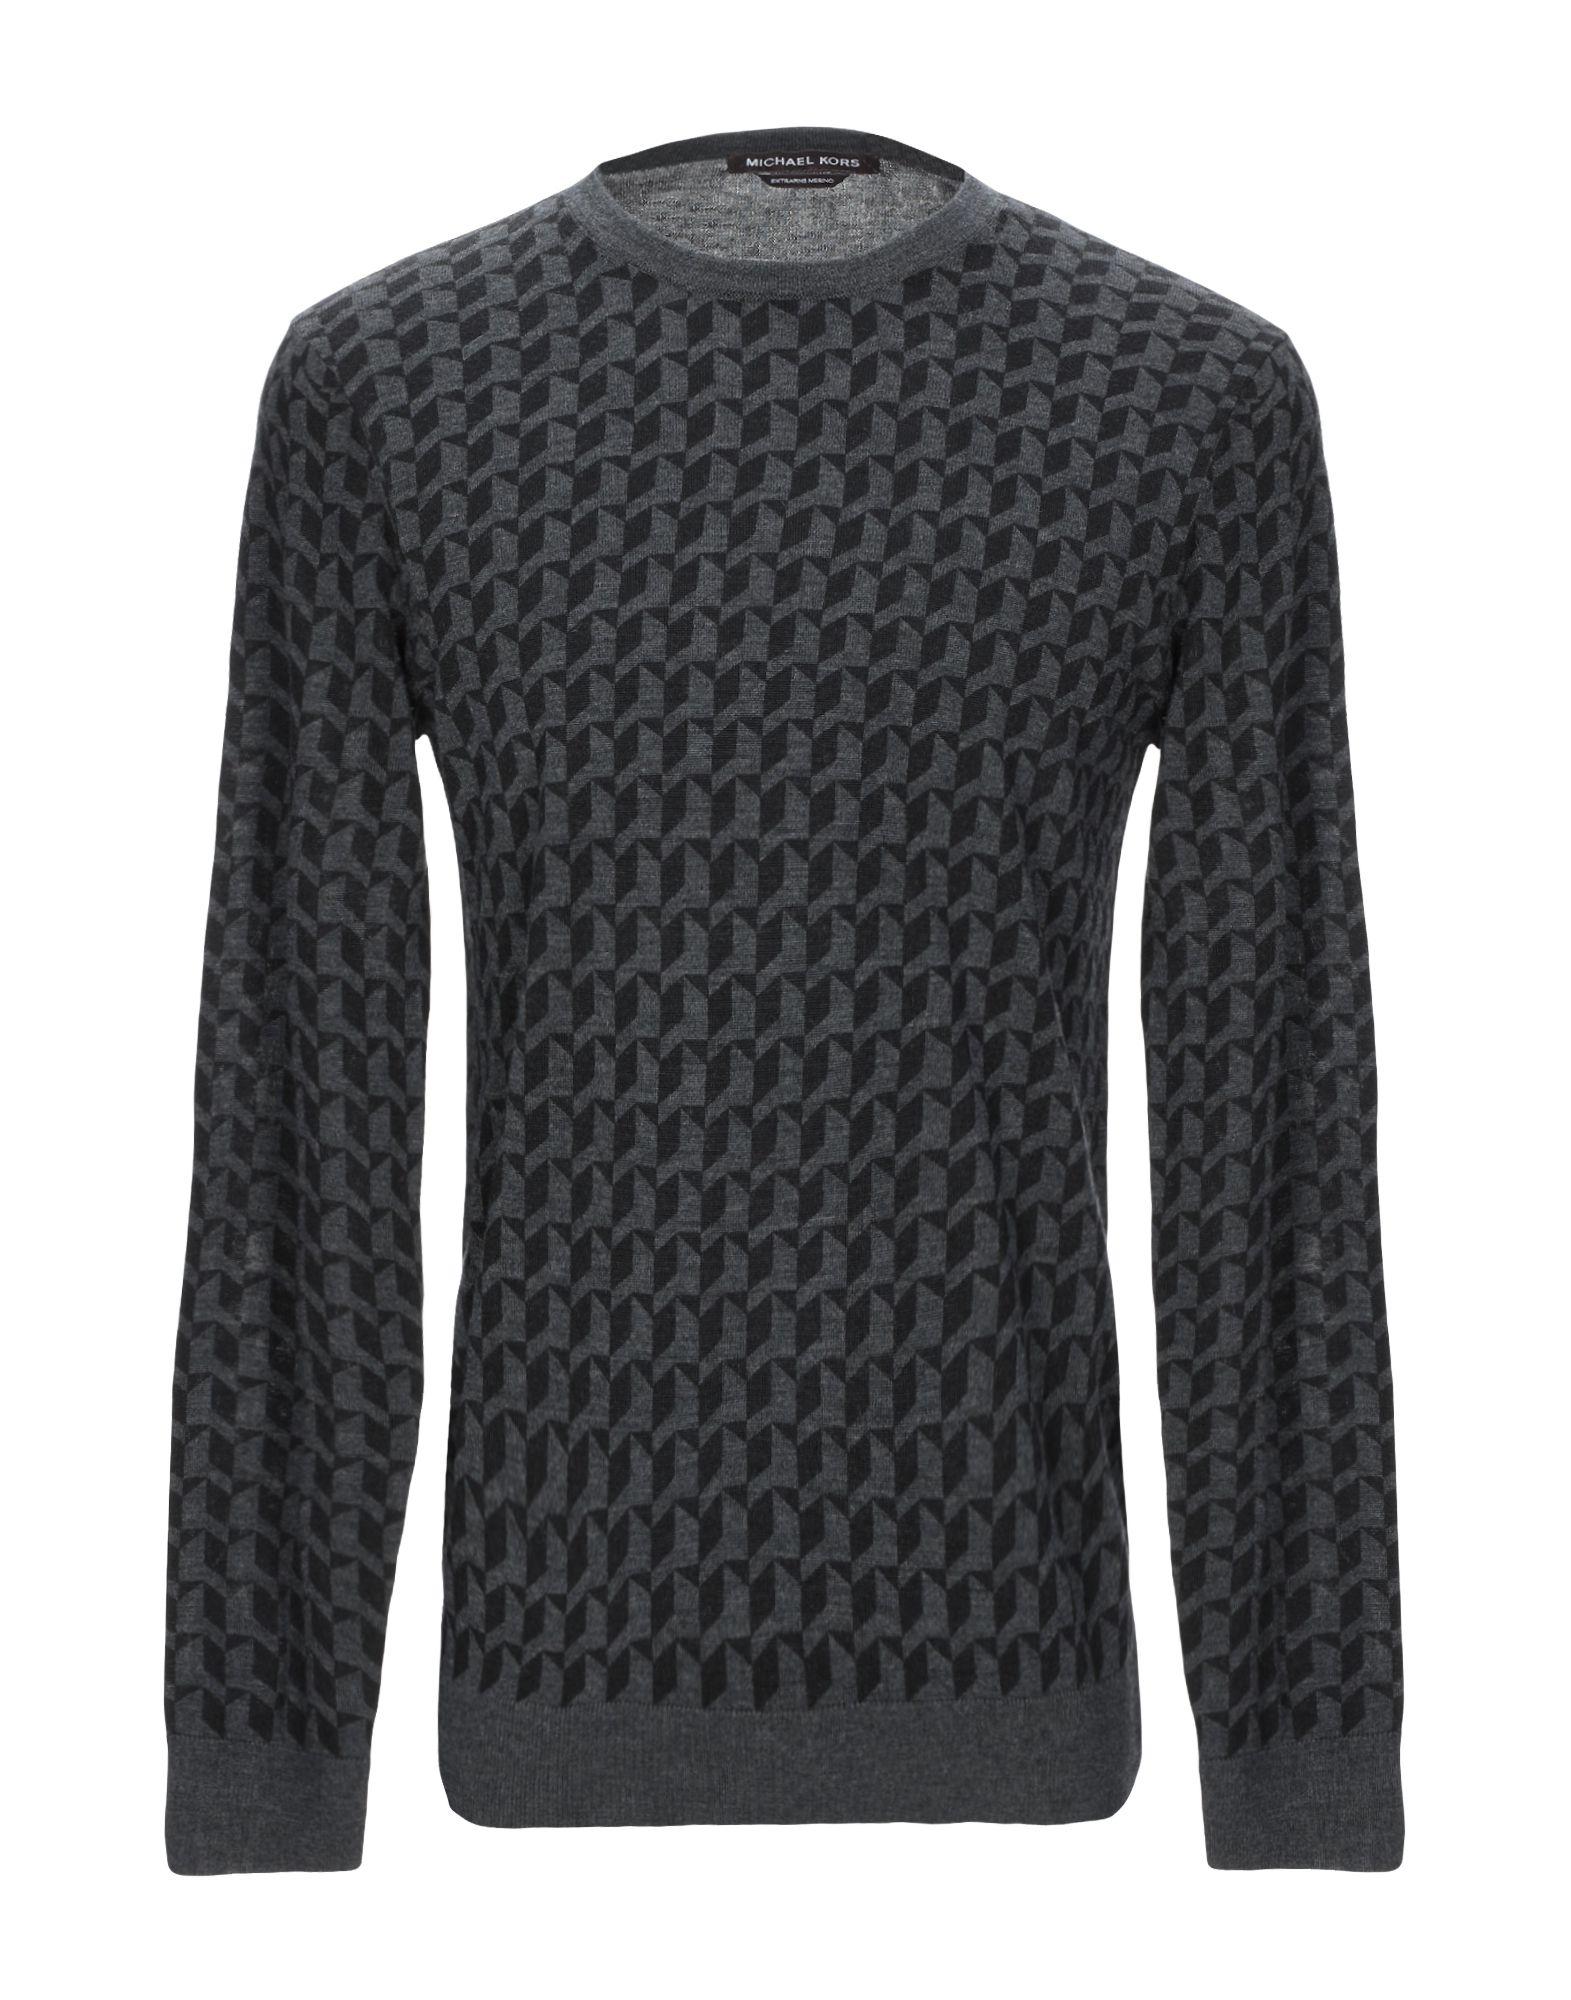 612380774 Michael Kors Mens Sweater - Men Michael Kors Mens Sweaters online on ...